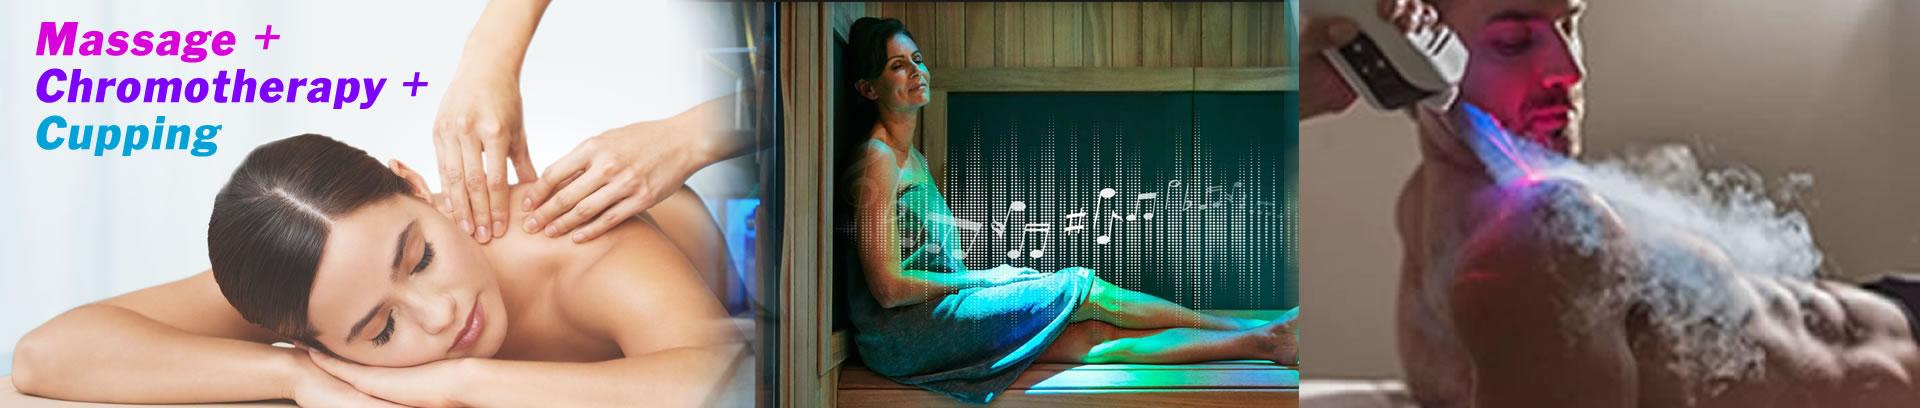 infrared sauna cupping massage